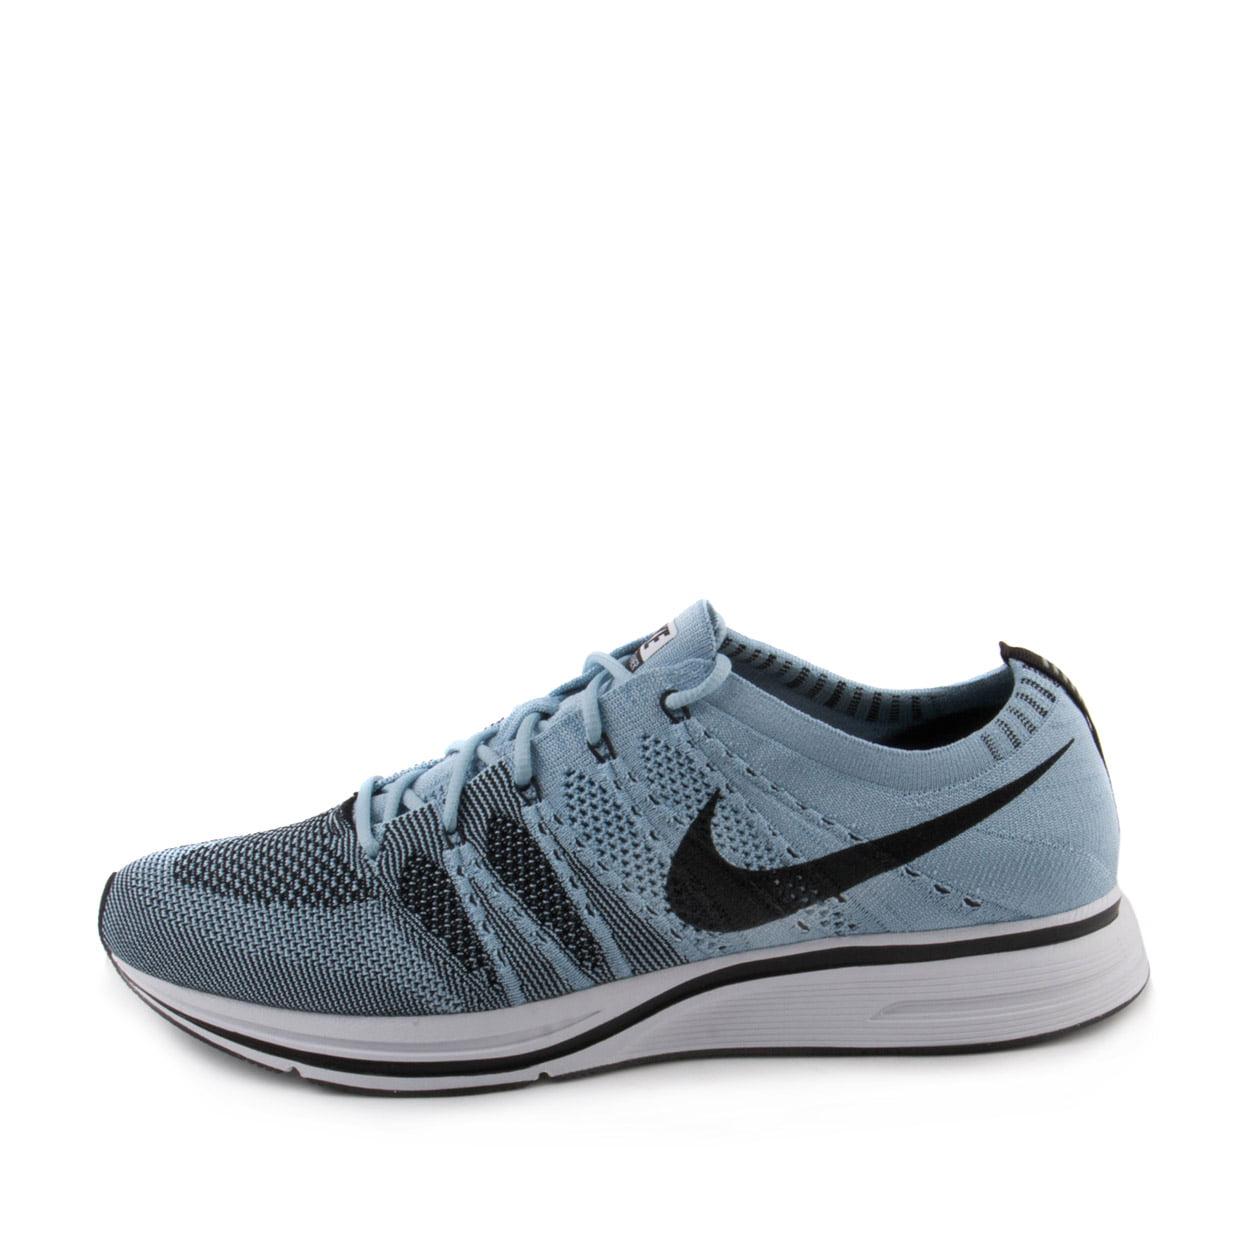 Nike Flyknit Trainer Cirrus Blue AH8396-400 Size 13